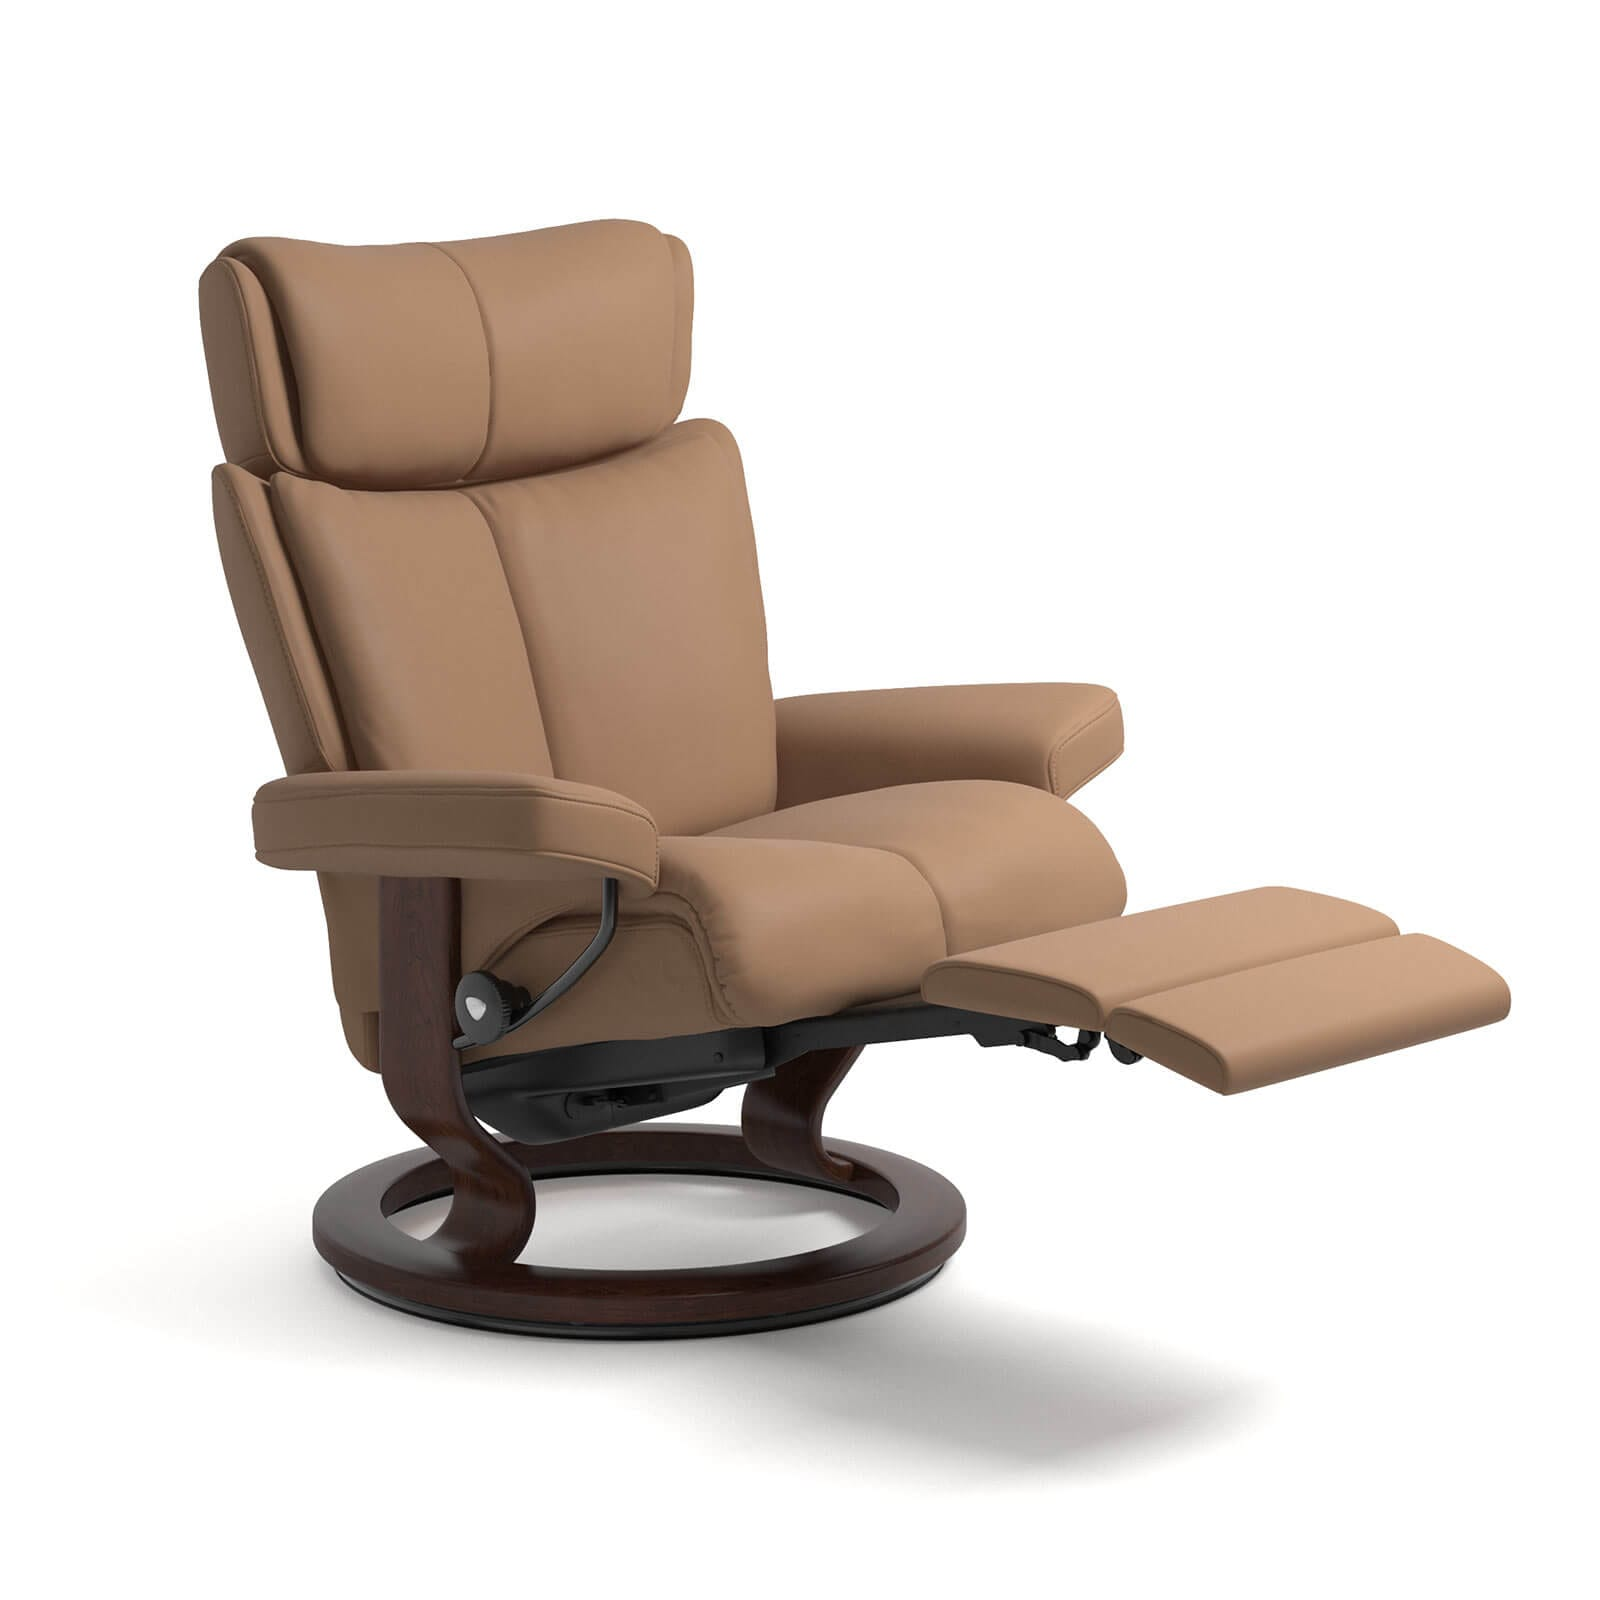 stressless sessel magic legcomfort batick latte stressless. Black Bedroom Furniture Sets. Home Design Ideas